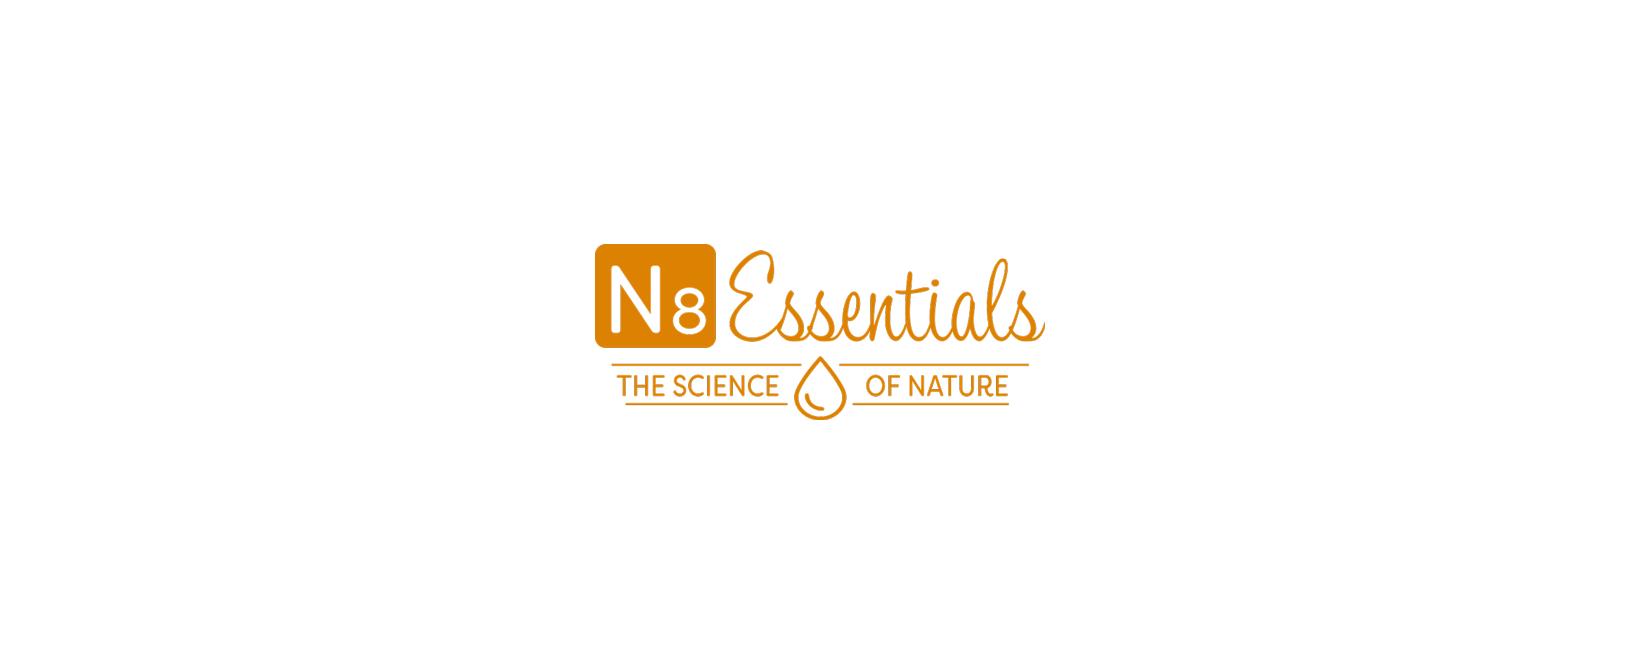 N8 Essentials Discount Code 2021